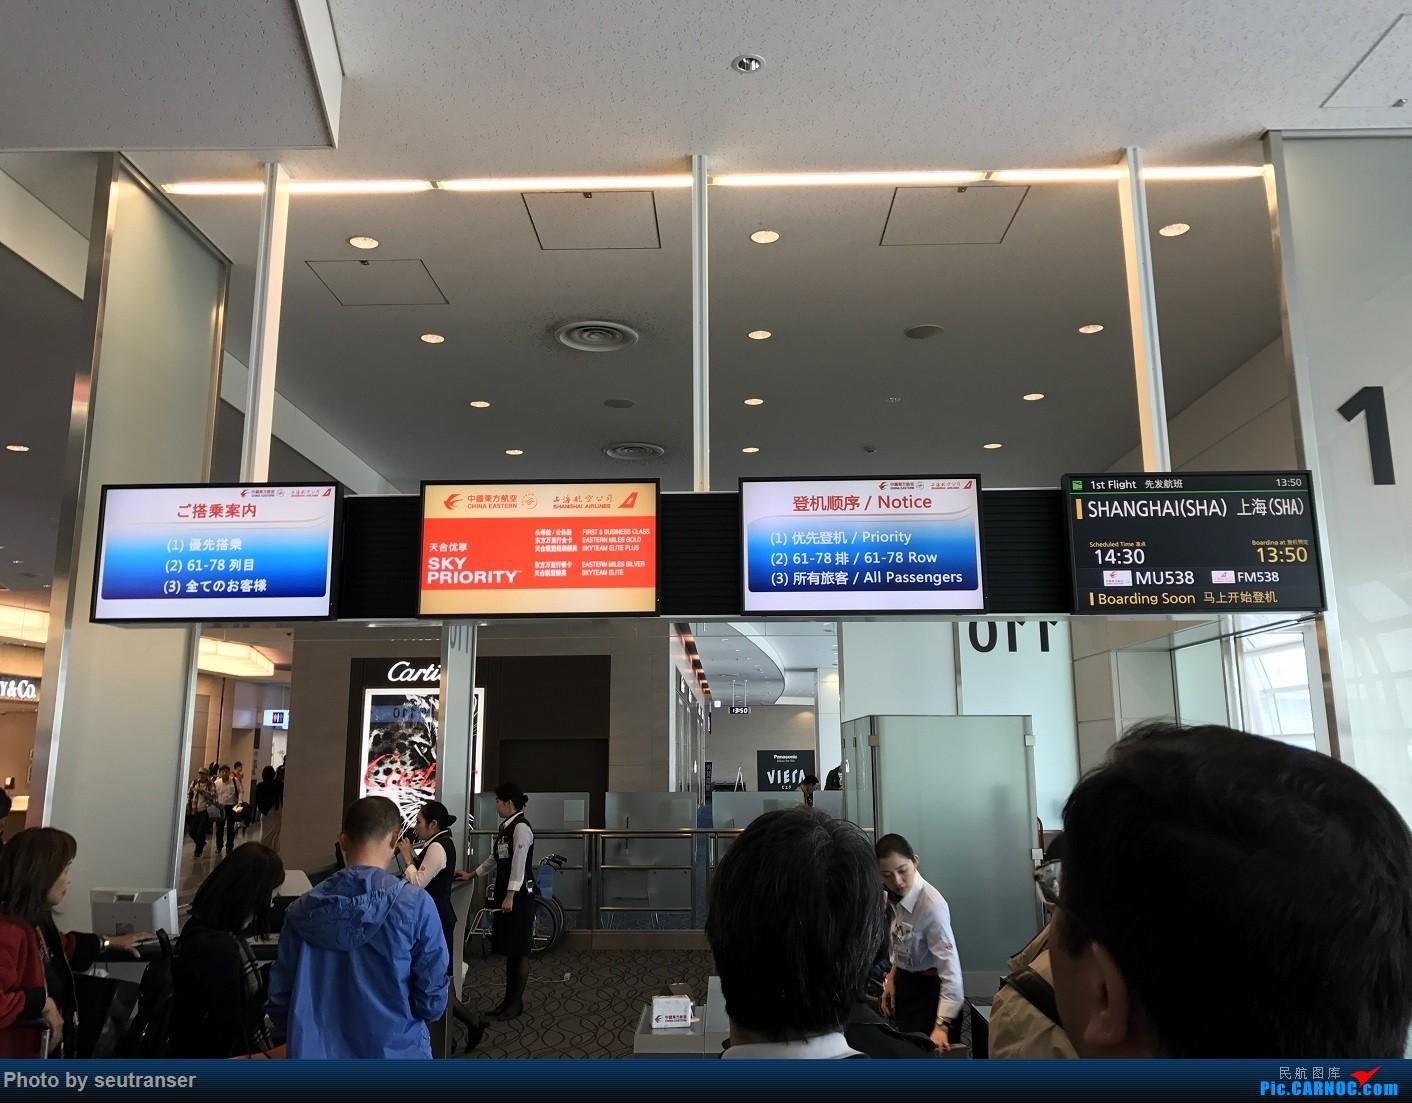 Re:[原创]迟到一年的游记,记第一次出国游 日本10天东航往返+ANA国内线+羽田机场拍机 AIRBUS A330-300 B-6097  日本东京羽田国际机场